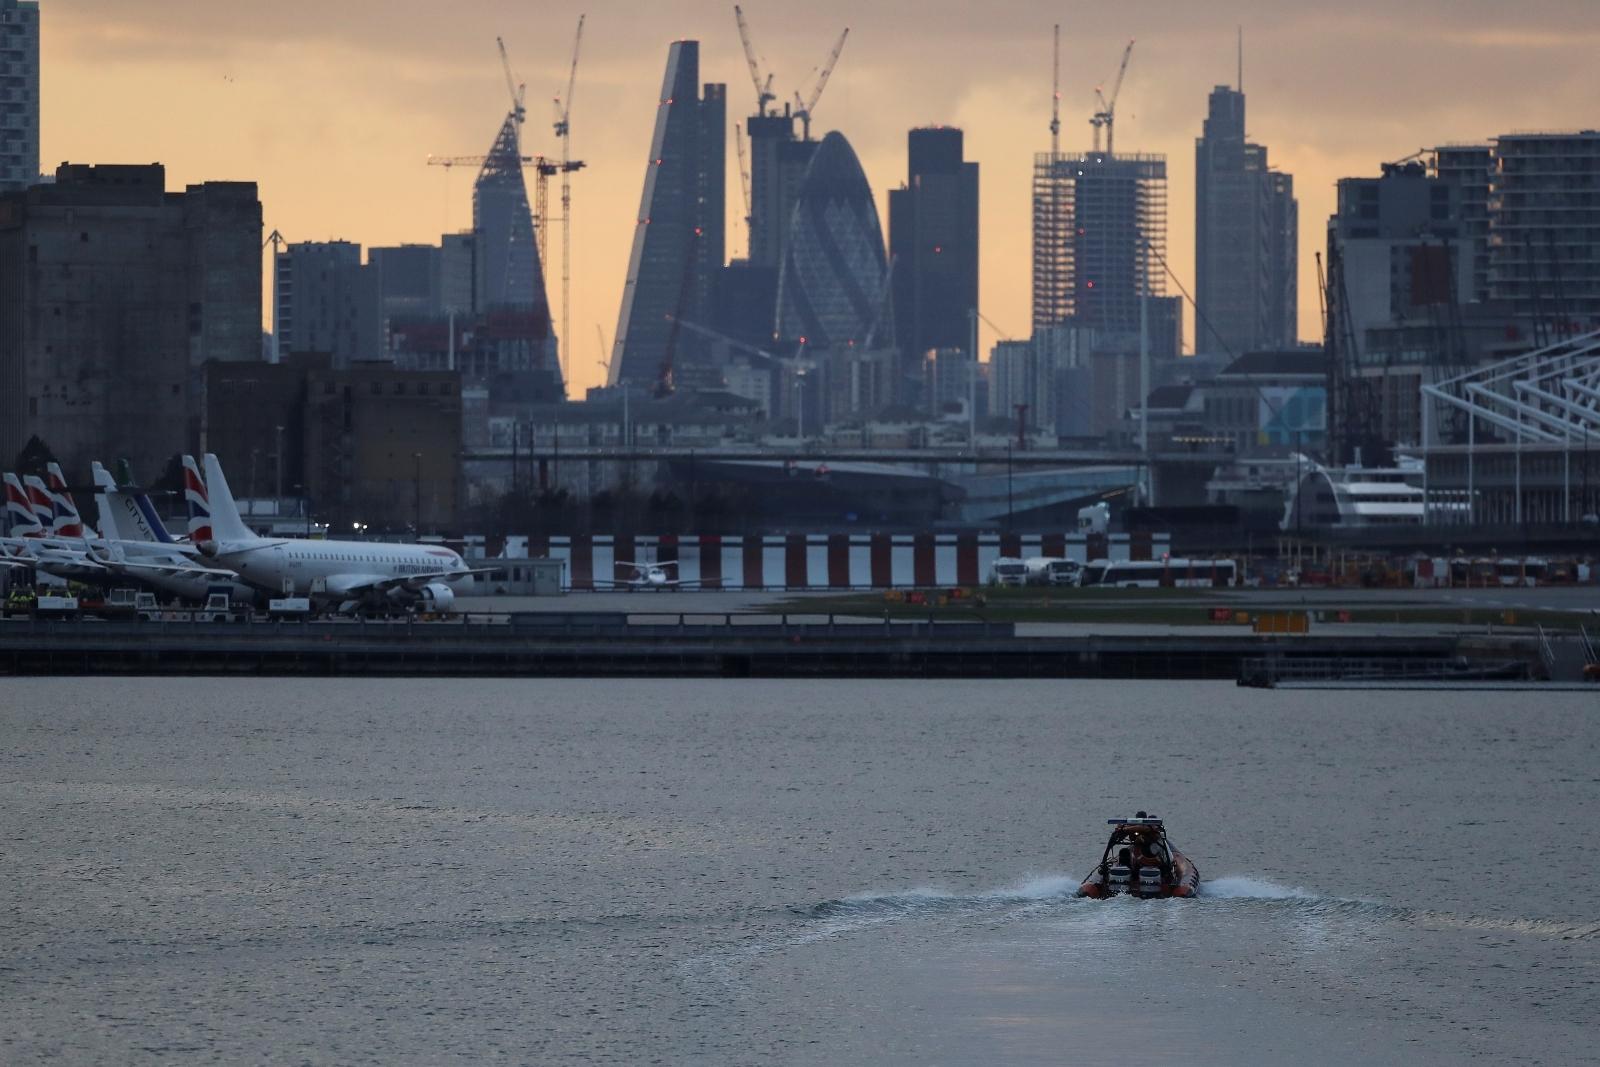 Bomb disposal London City Airport